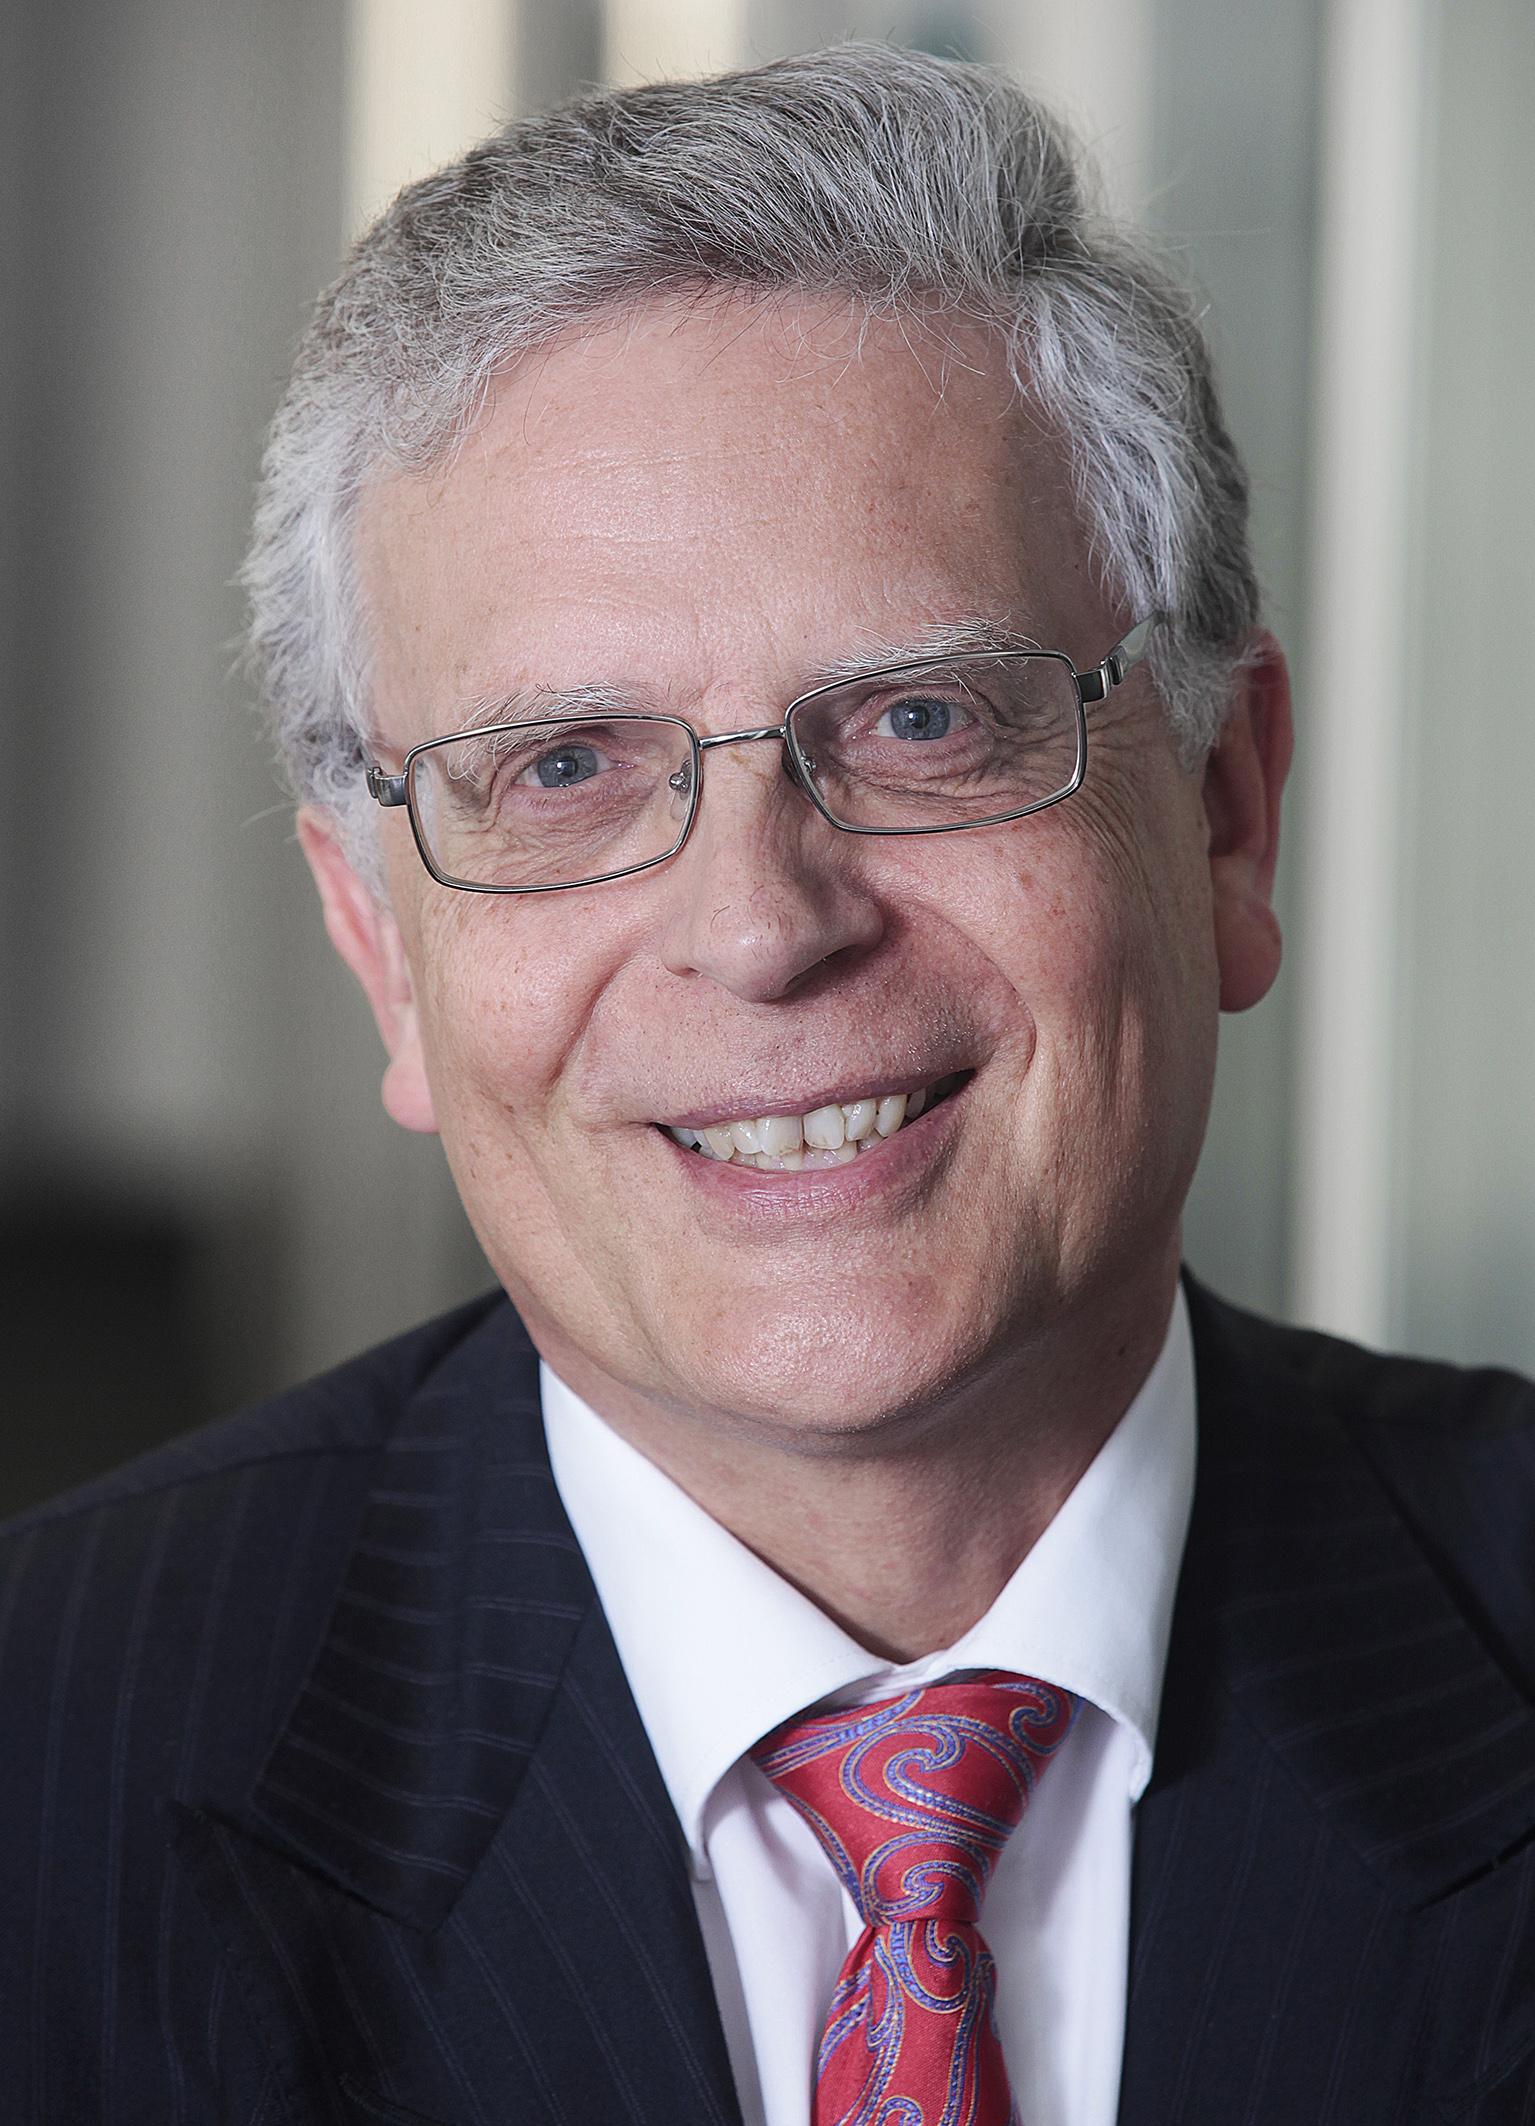 Dr. Georg Hanen